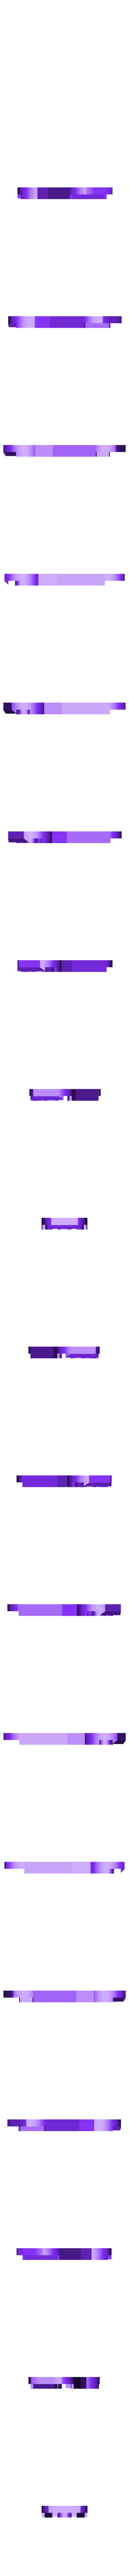 Mount_Bracket.stl Download free STL file Mechanical Quick Grab/Release Phone Stand • 3D printable object, arron_mollet22